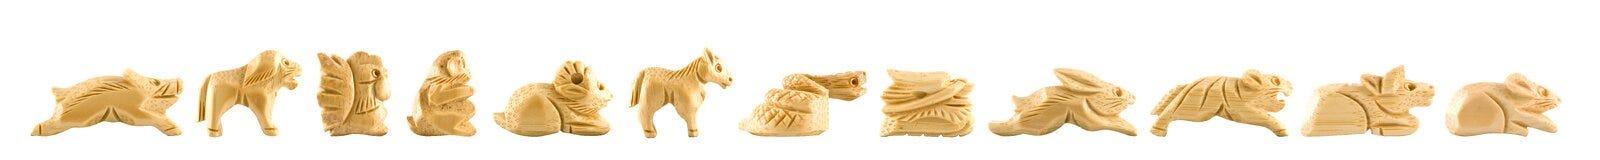 kinesisk teckenträsnideri royaltyfri foto